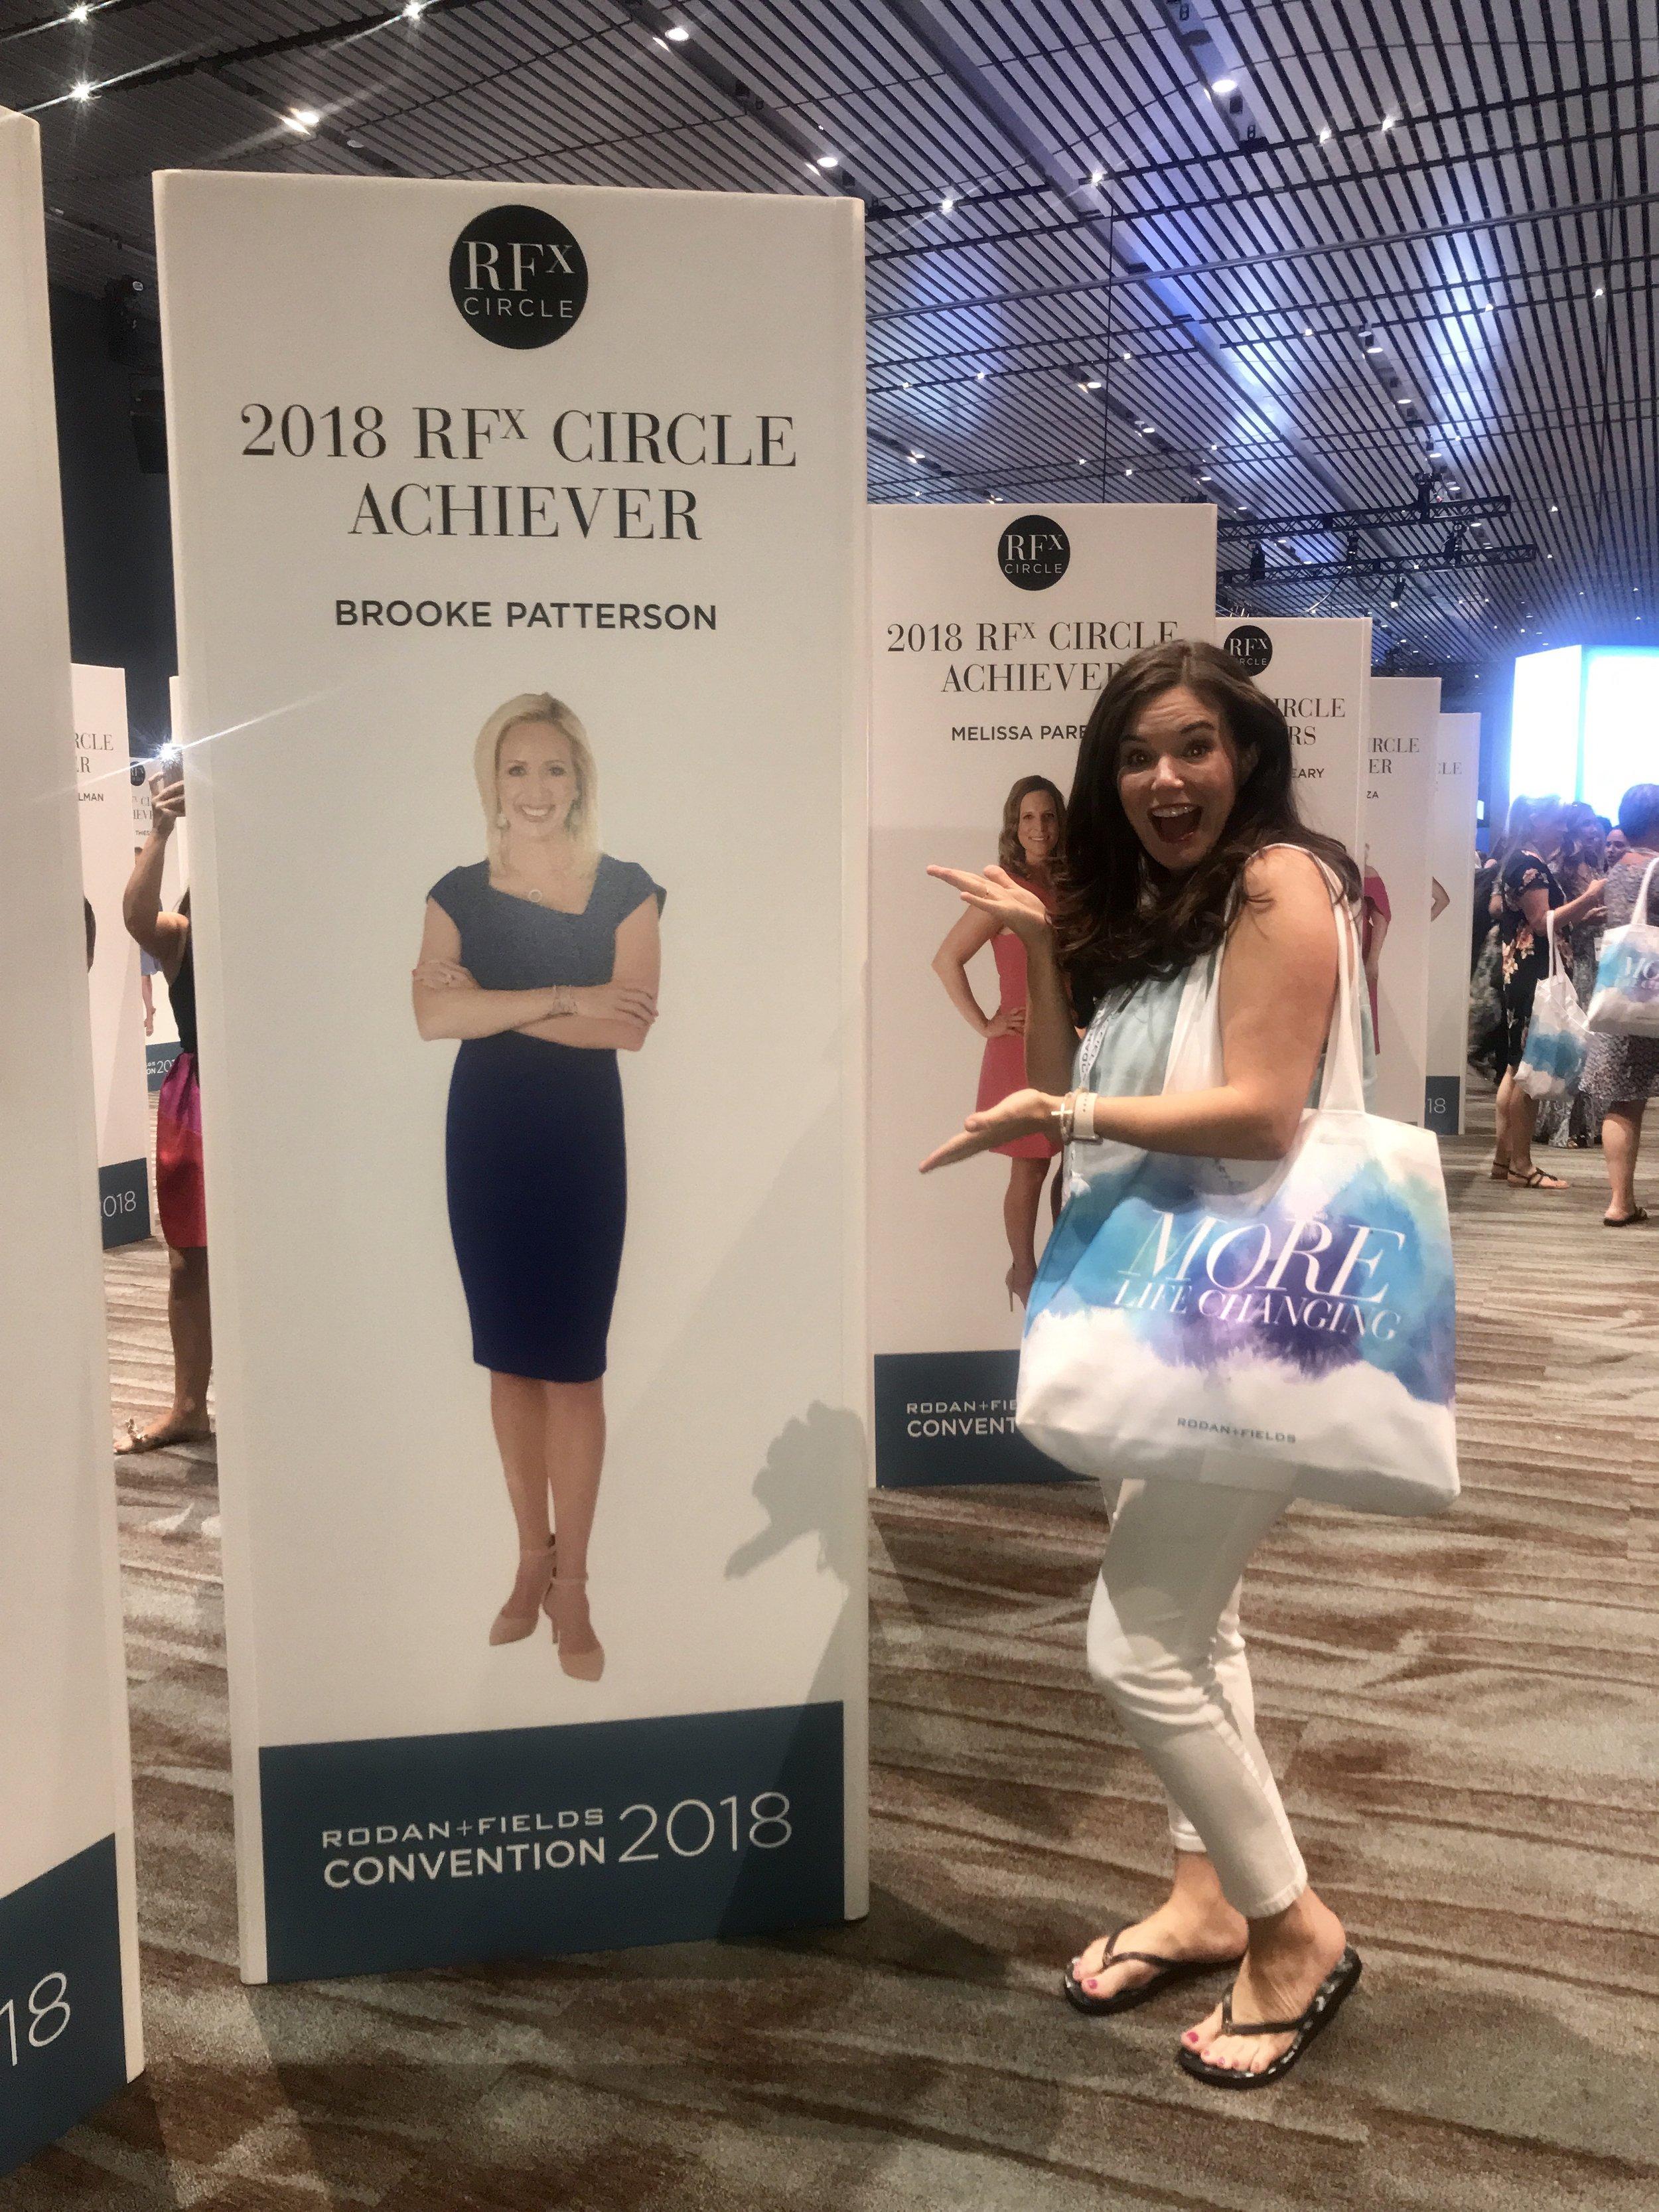 Rodan + Fields Convention - RFx Circle Achiever Brooke Patterson and photographer Kassady Gibson